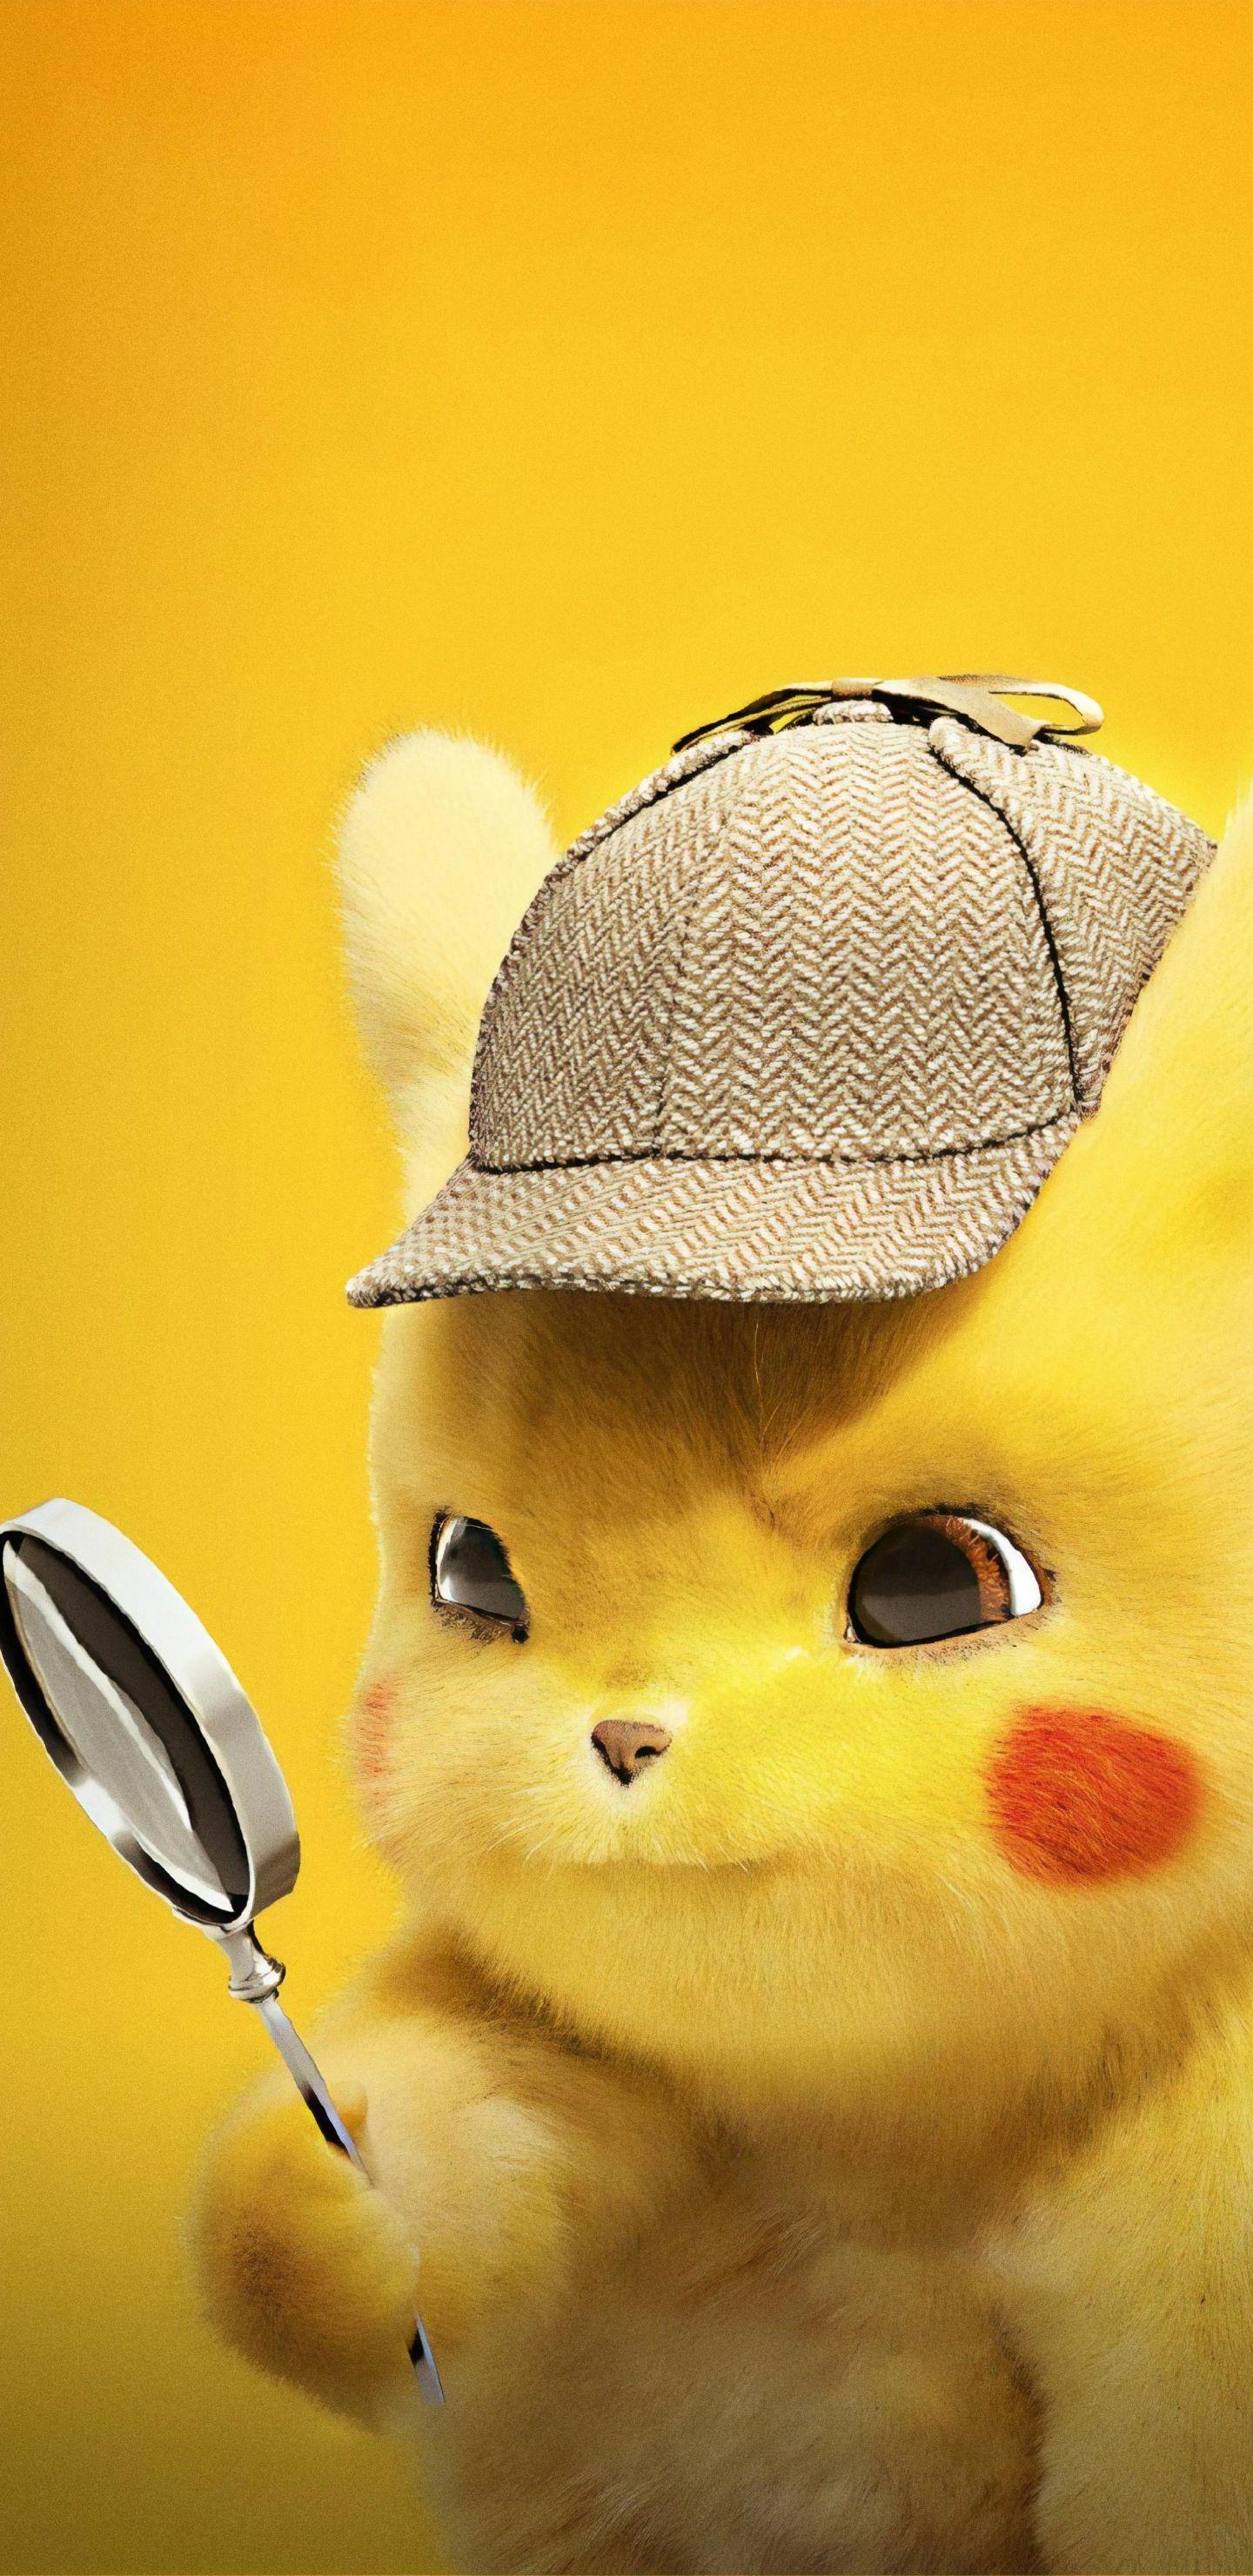 Pokemon Detective Pikachu Wallpaper Iphone Pikachu Pokemon Detective